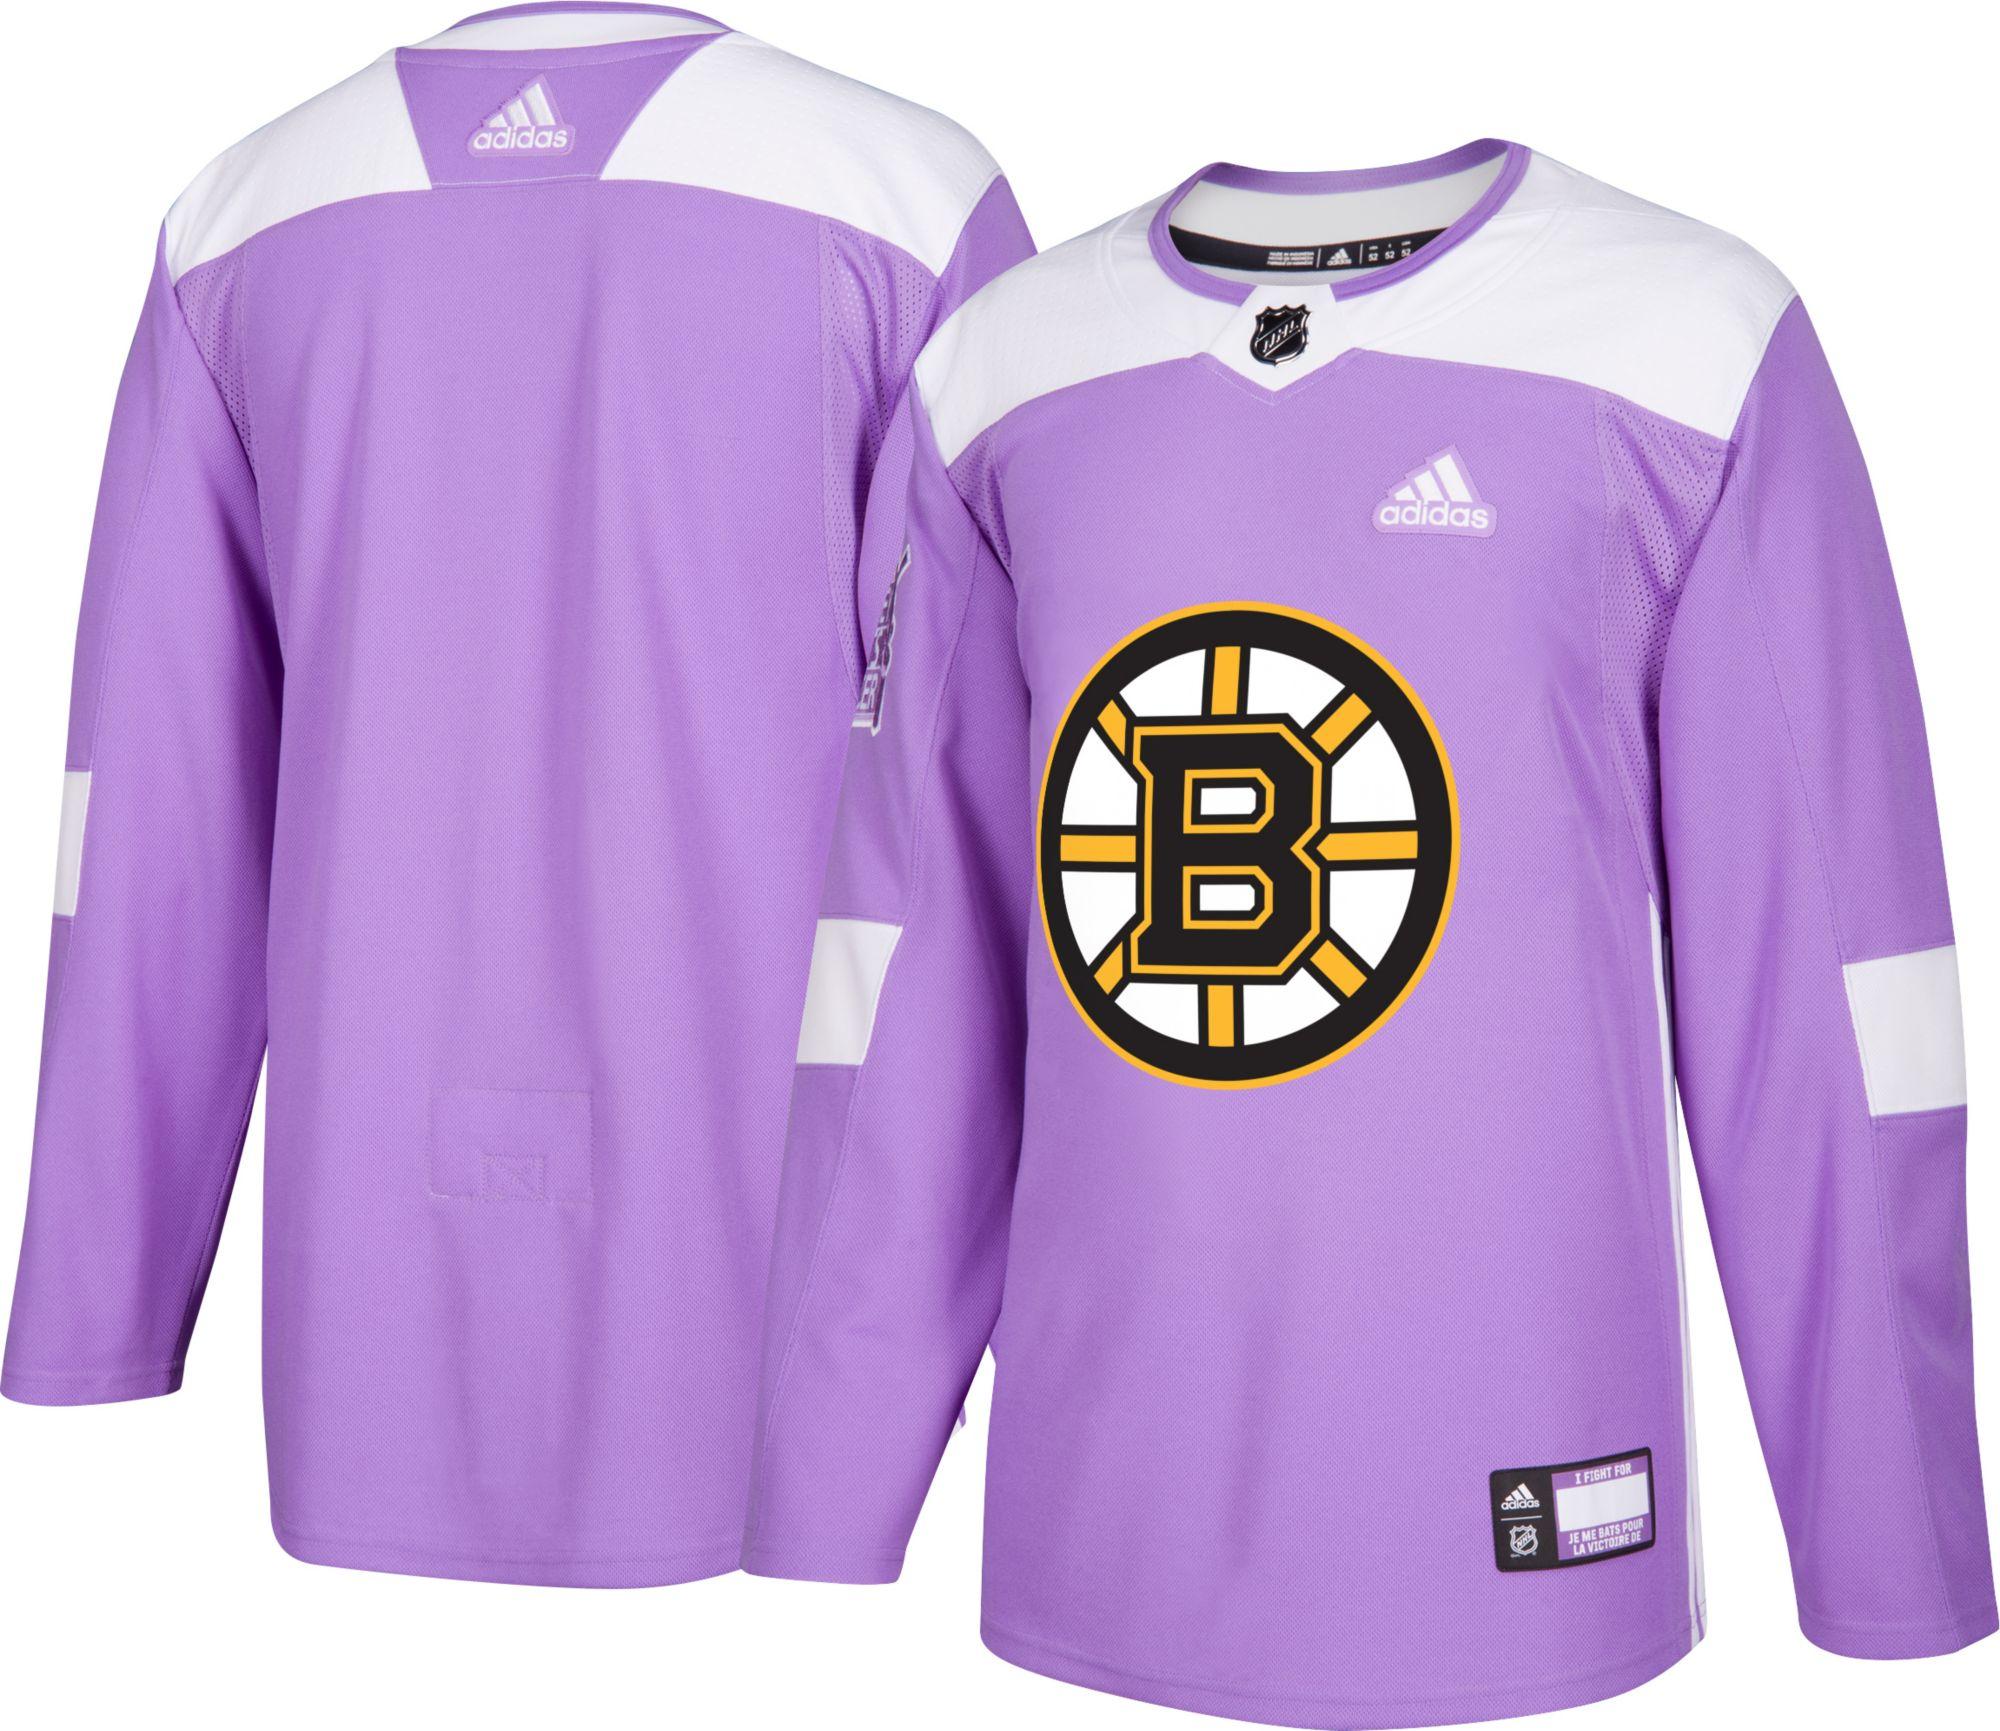 2754fdc64 boston bruins purple jersey